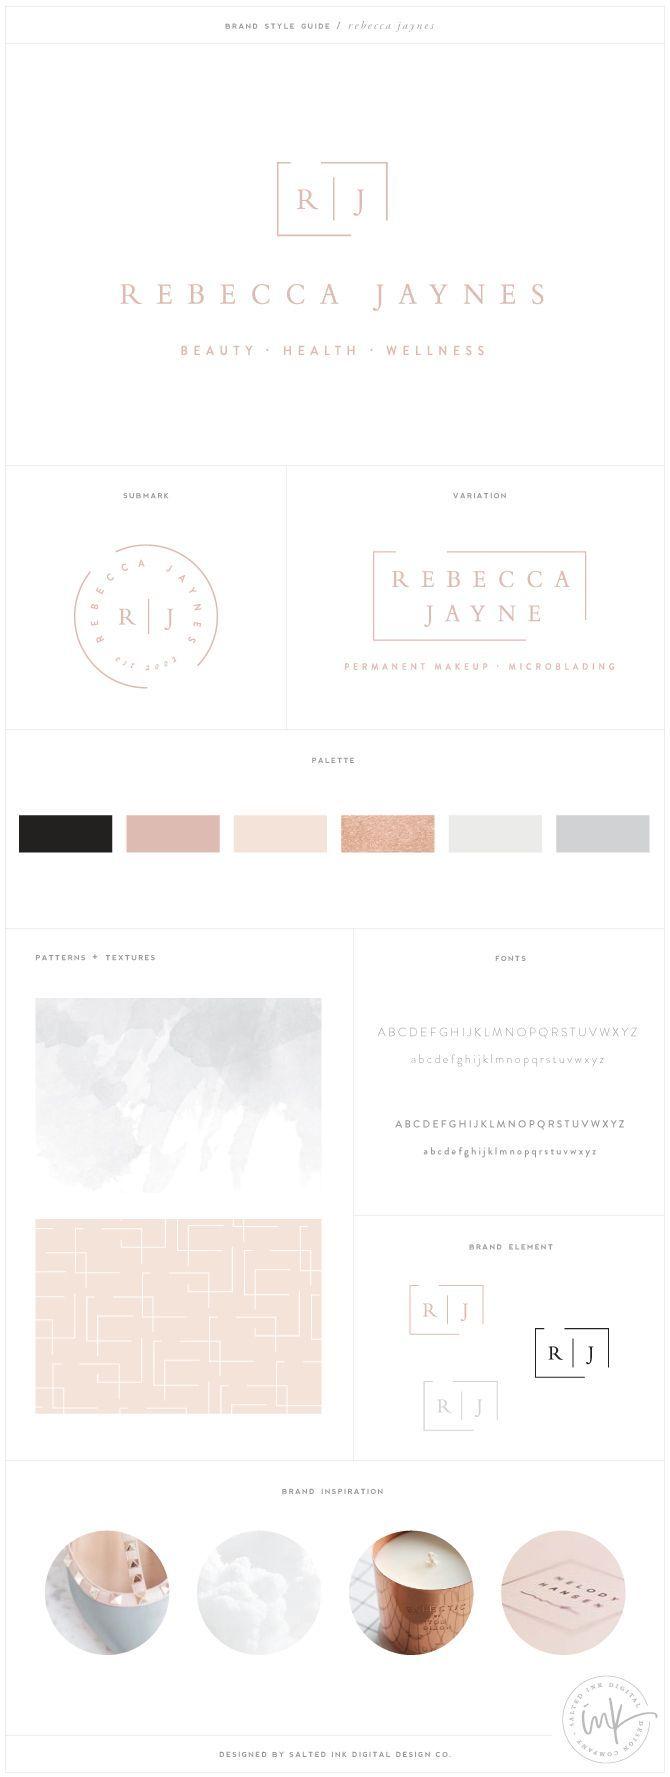 Rebecca Jaynes Beauty Salon Brand Design by Salted Ink | Salon Branding | Brand Design and Website Design | View the full brand transformation at http://www.saltedink.com |